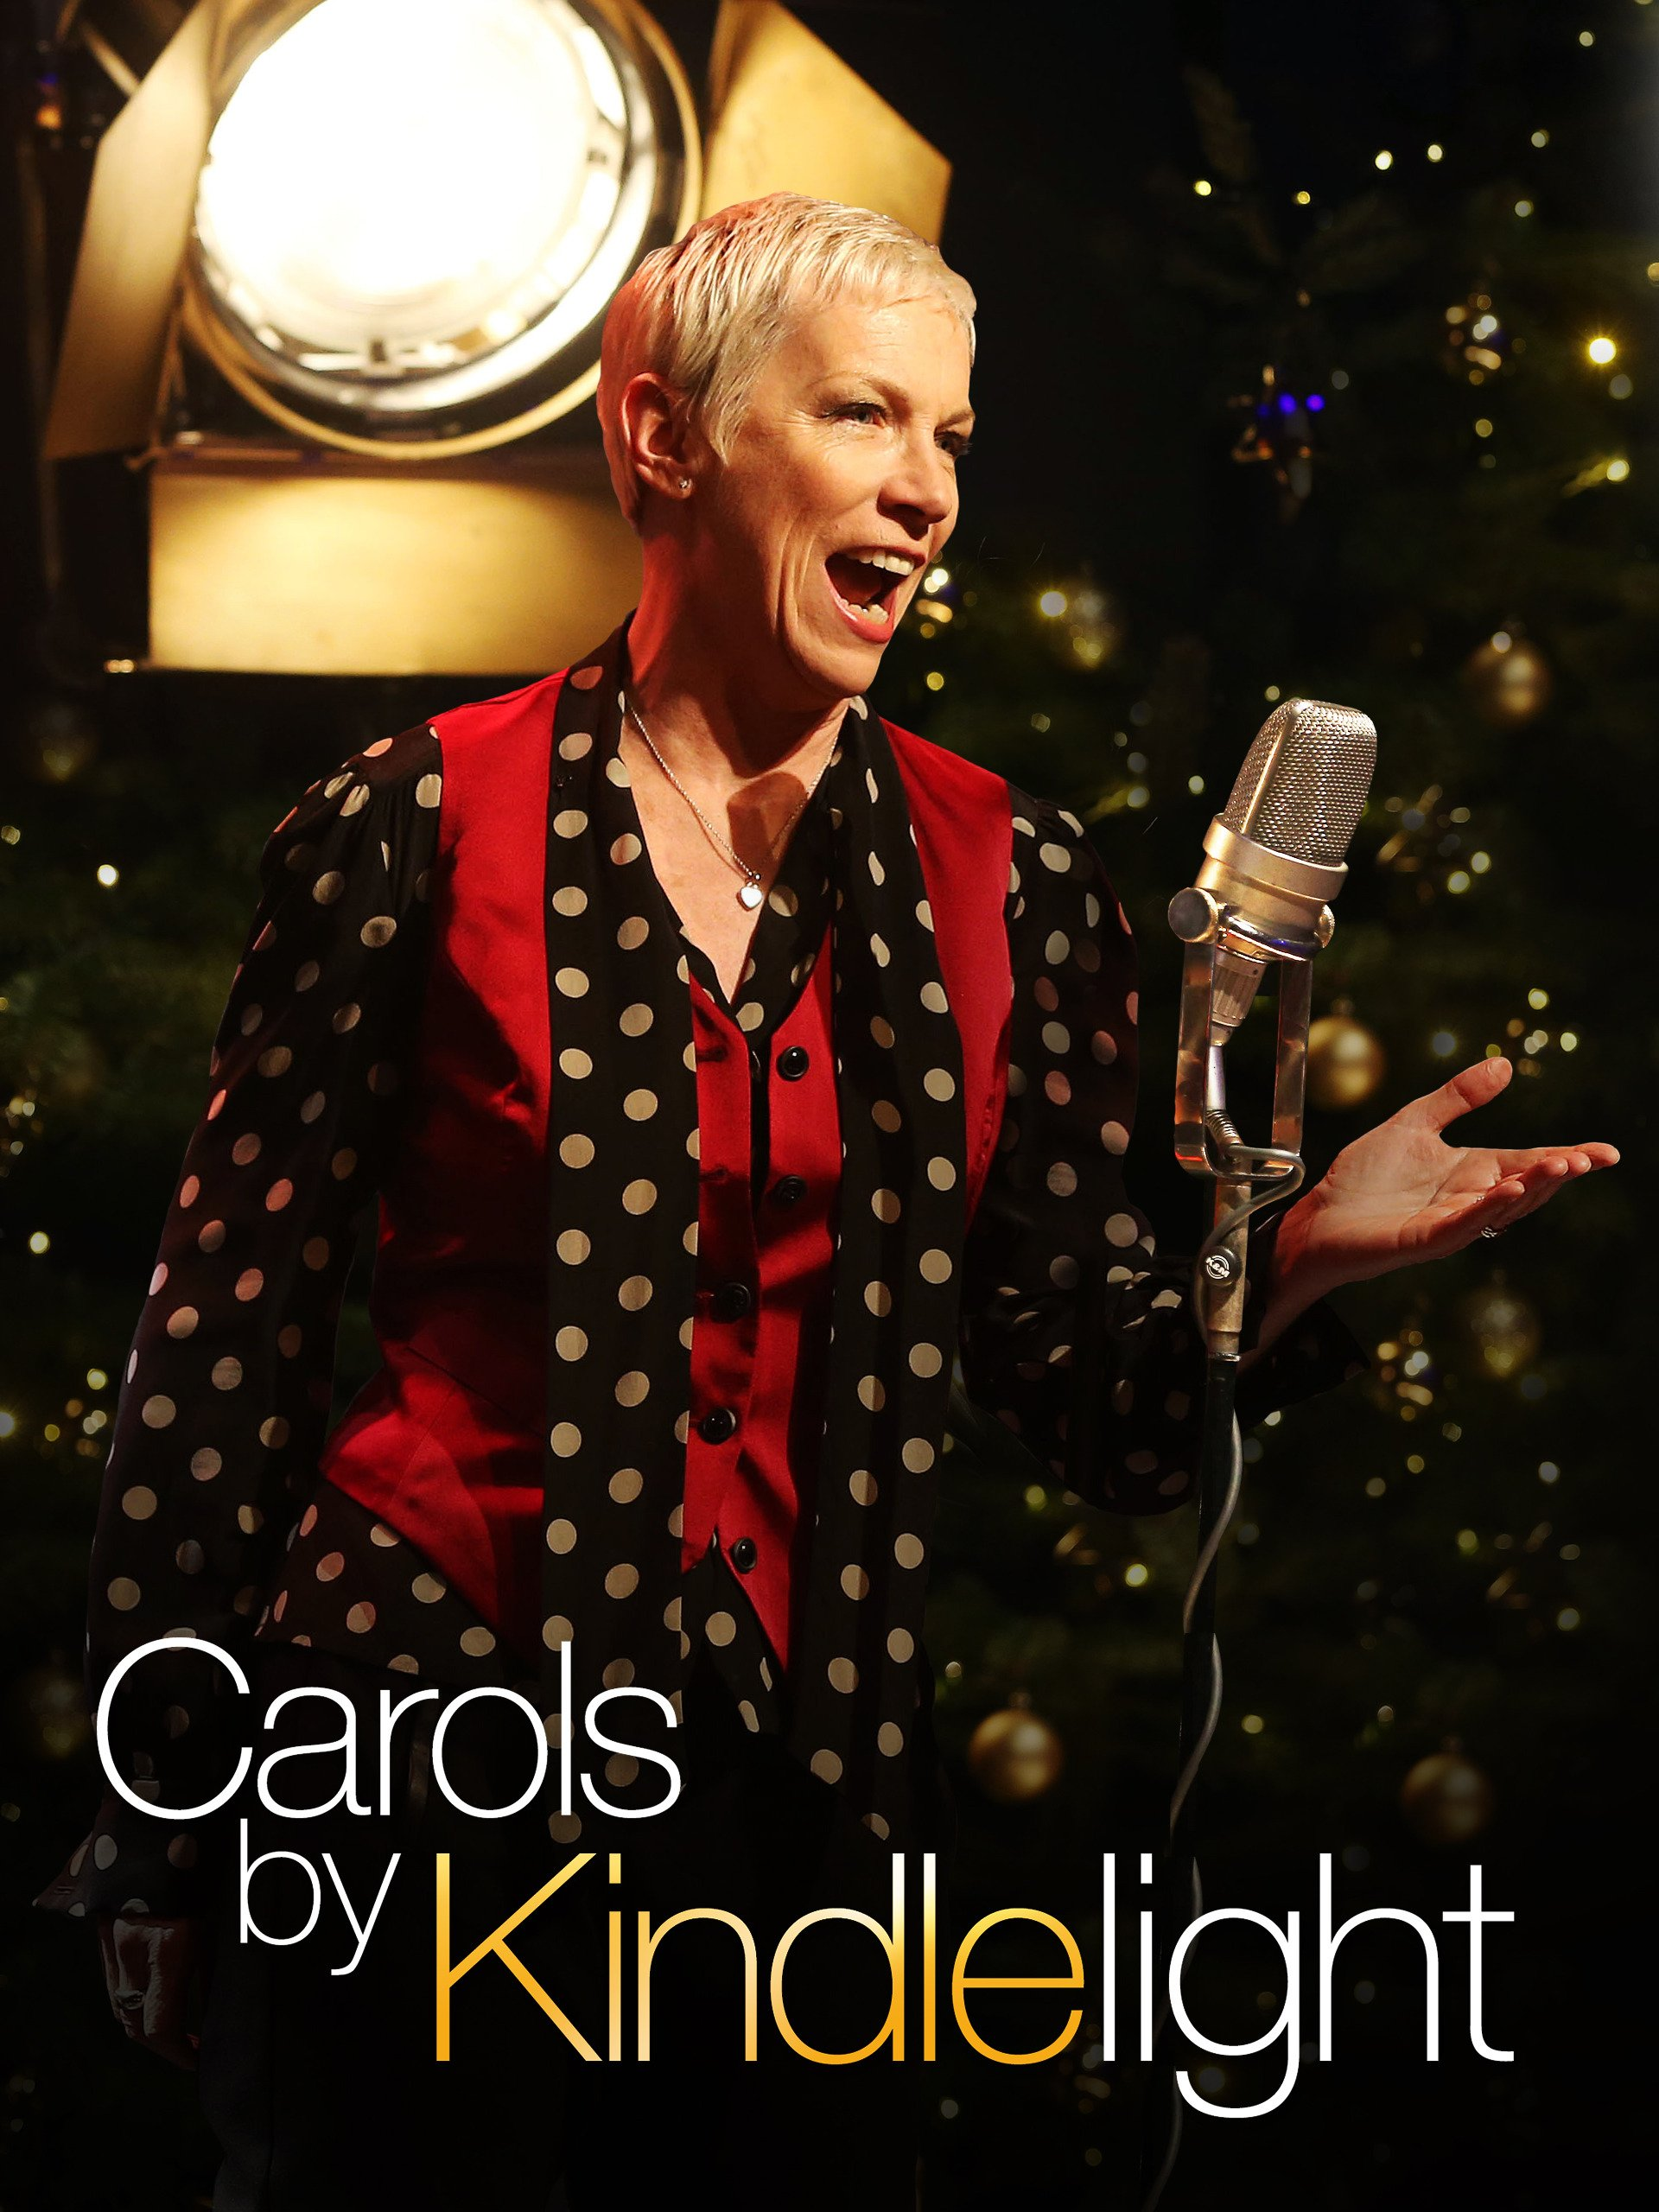 Carols by Kindlelight